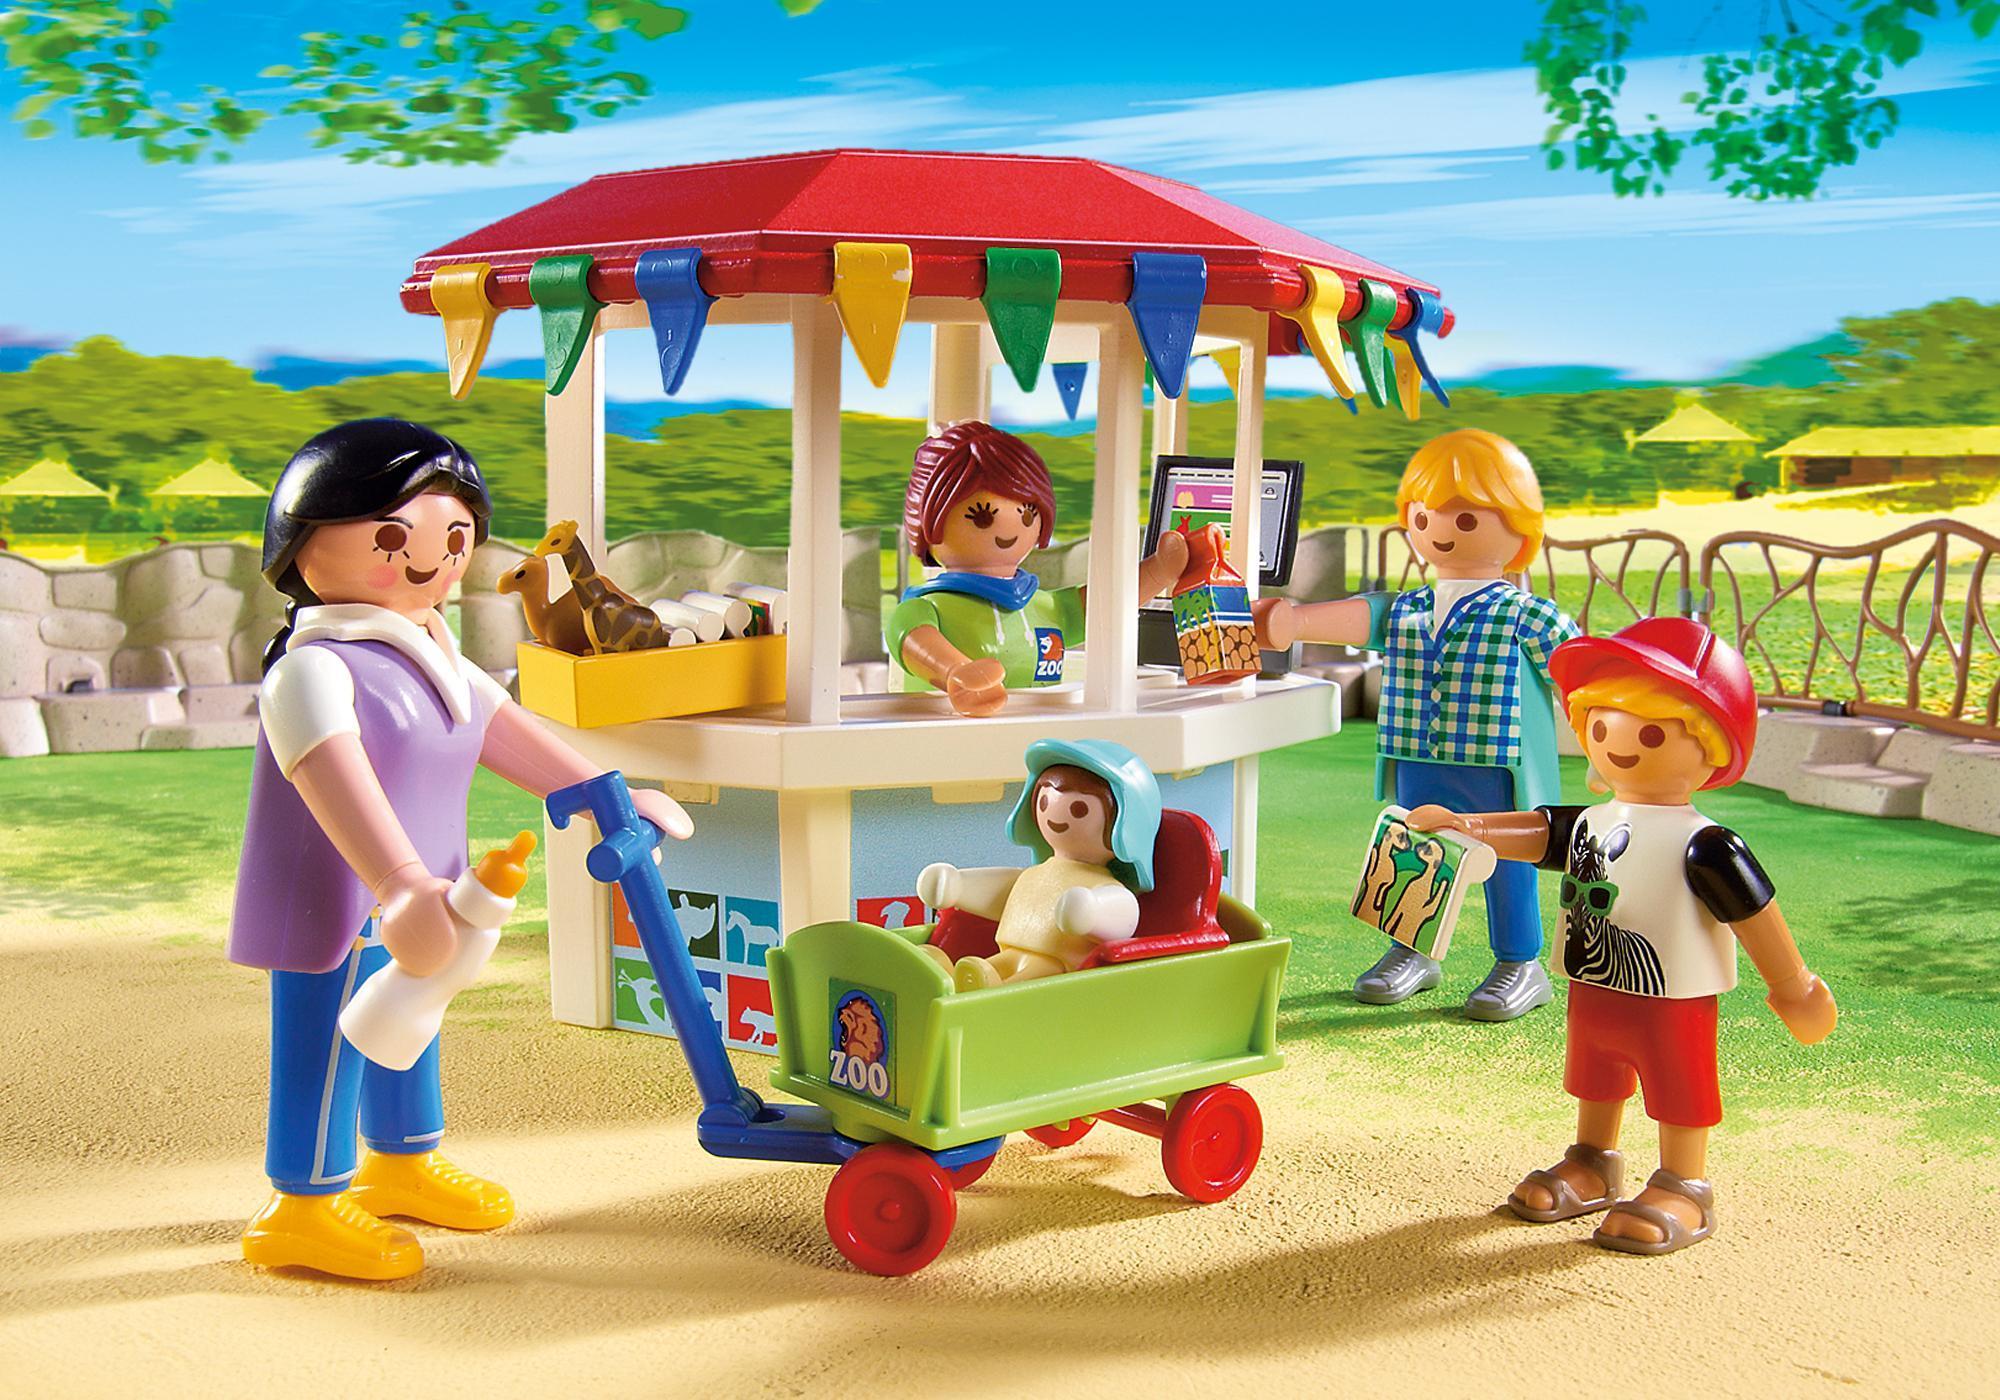 http://media.playmobil.com/i/playmobil/6634_product_extra1/Large City Zoo